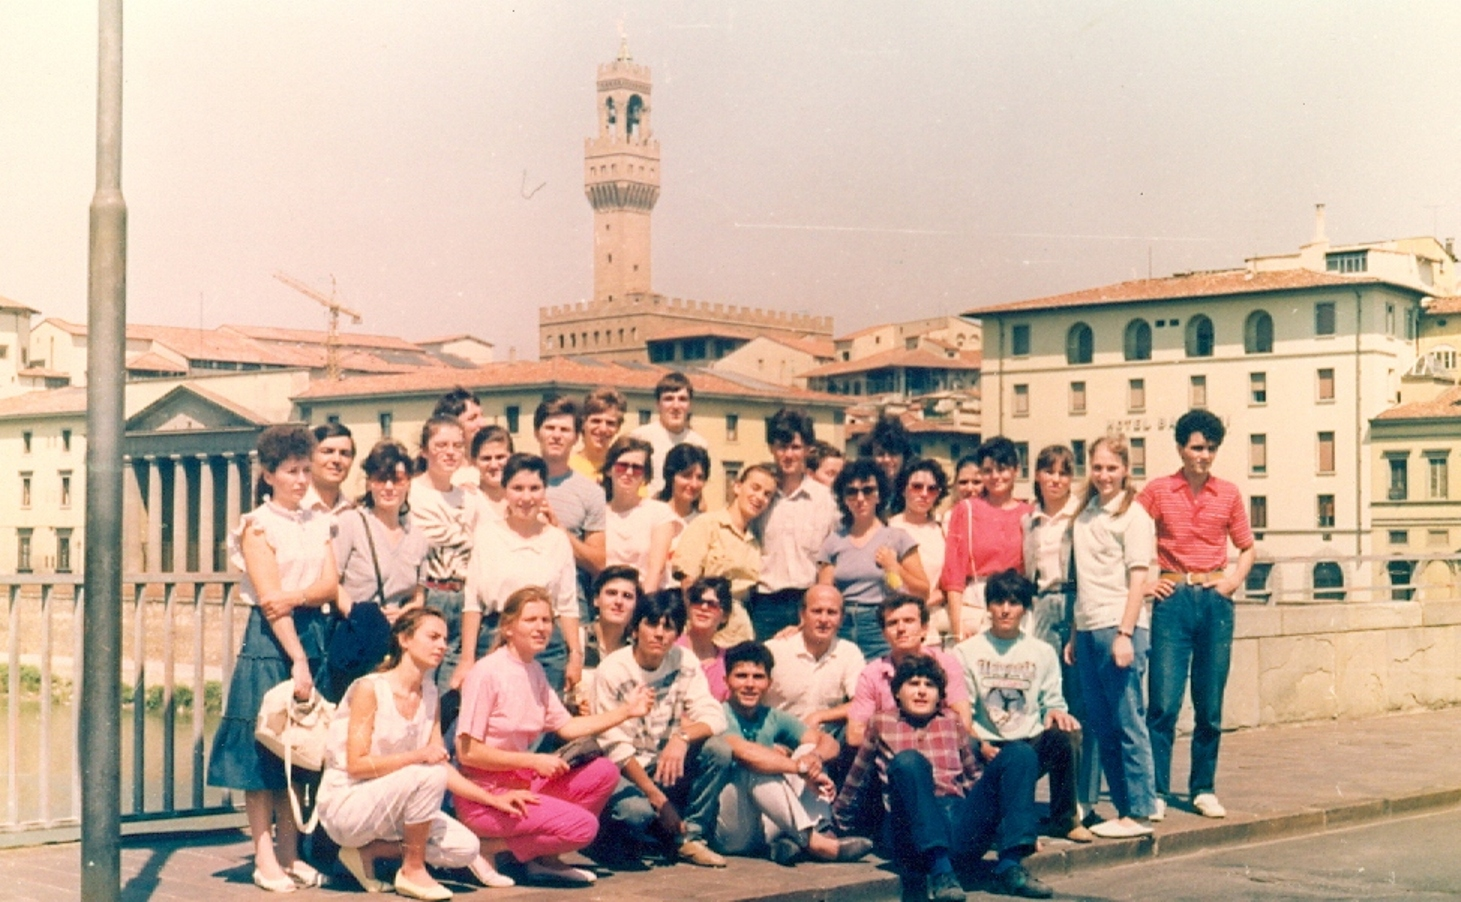 CORUL BISERICII CRESTINE DUPA EVANGHELIE DRAGOS VODA BUCURESTI IN AUGUST 1990